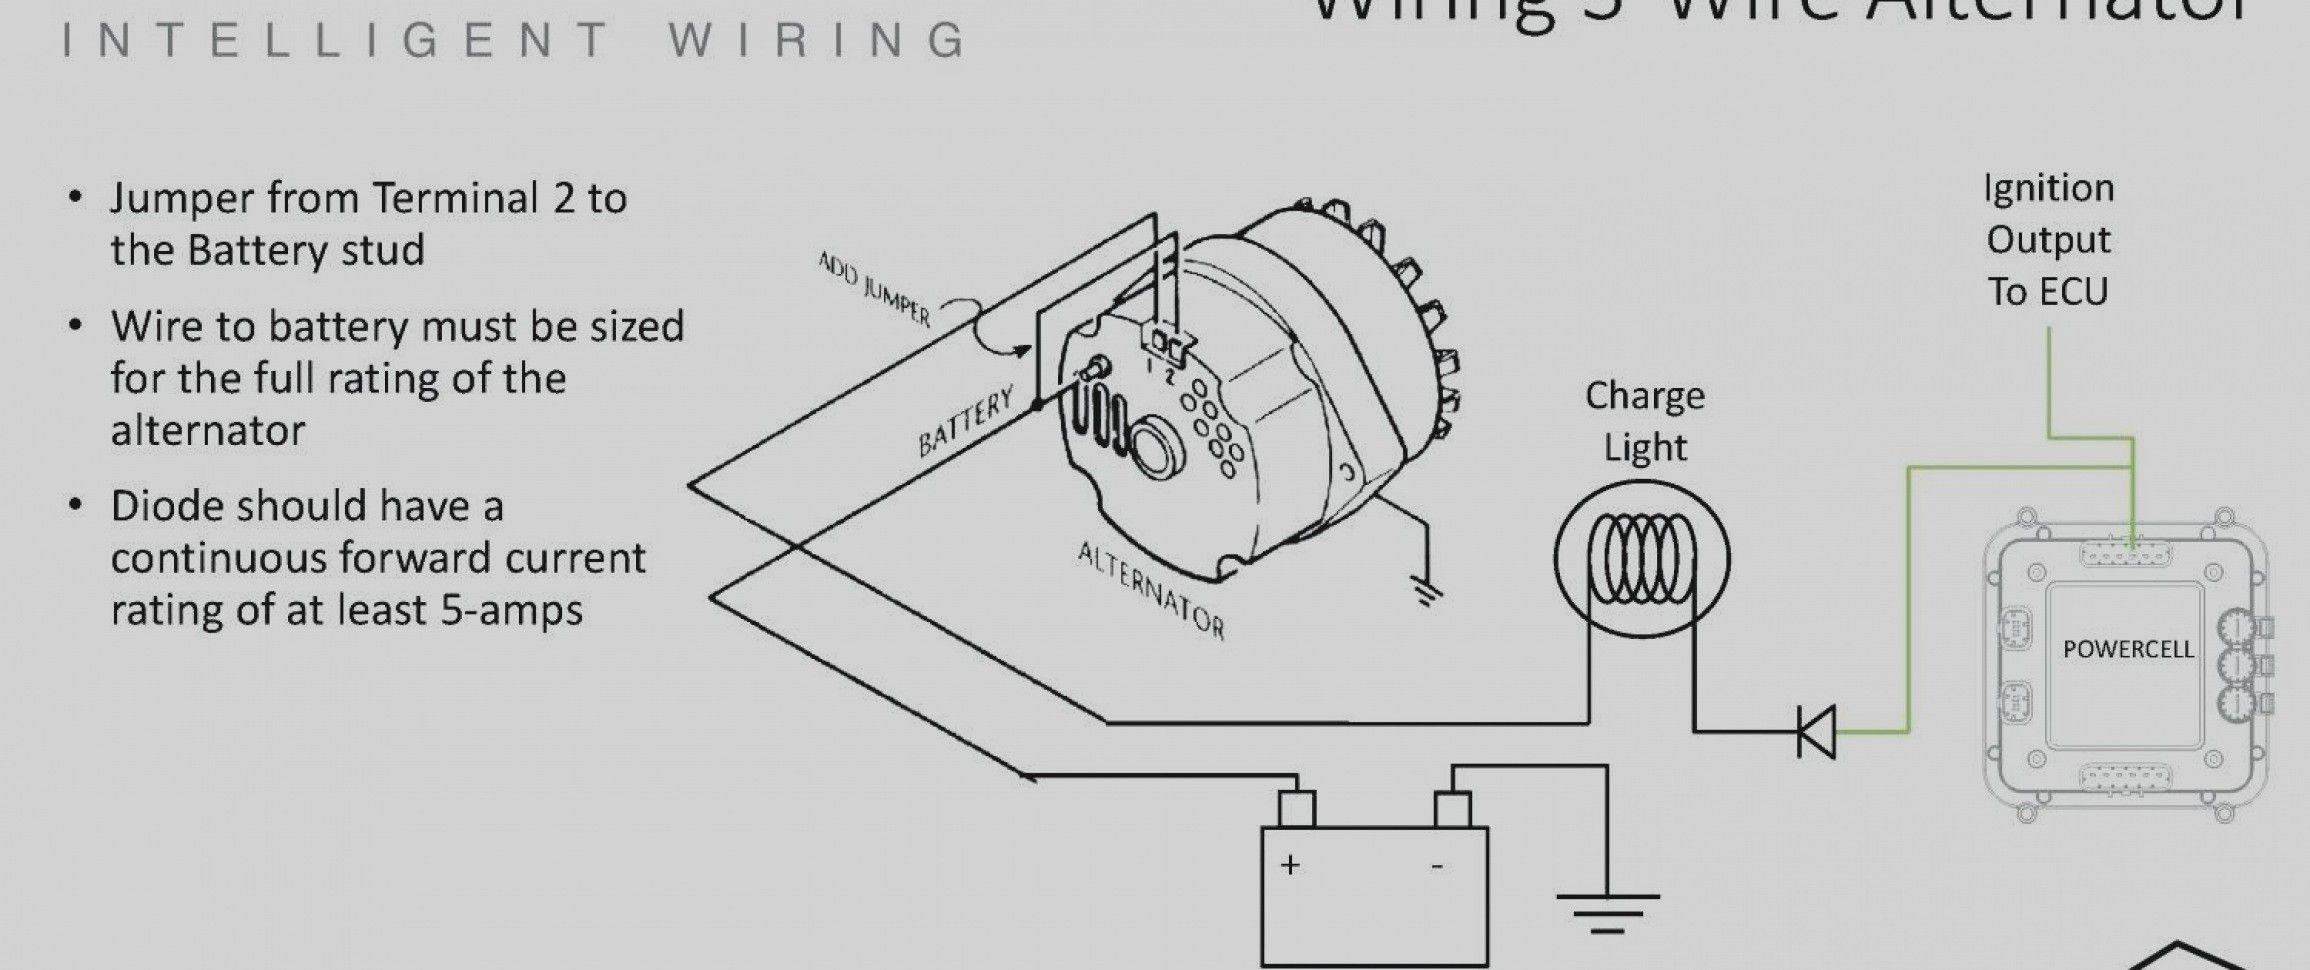 Unique Wiring Diagram 12v Alternator  Diagrams  Digramssample  Diagramimages